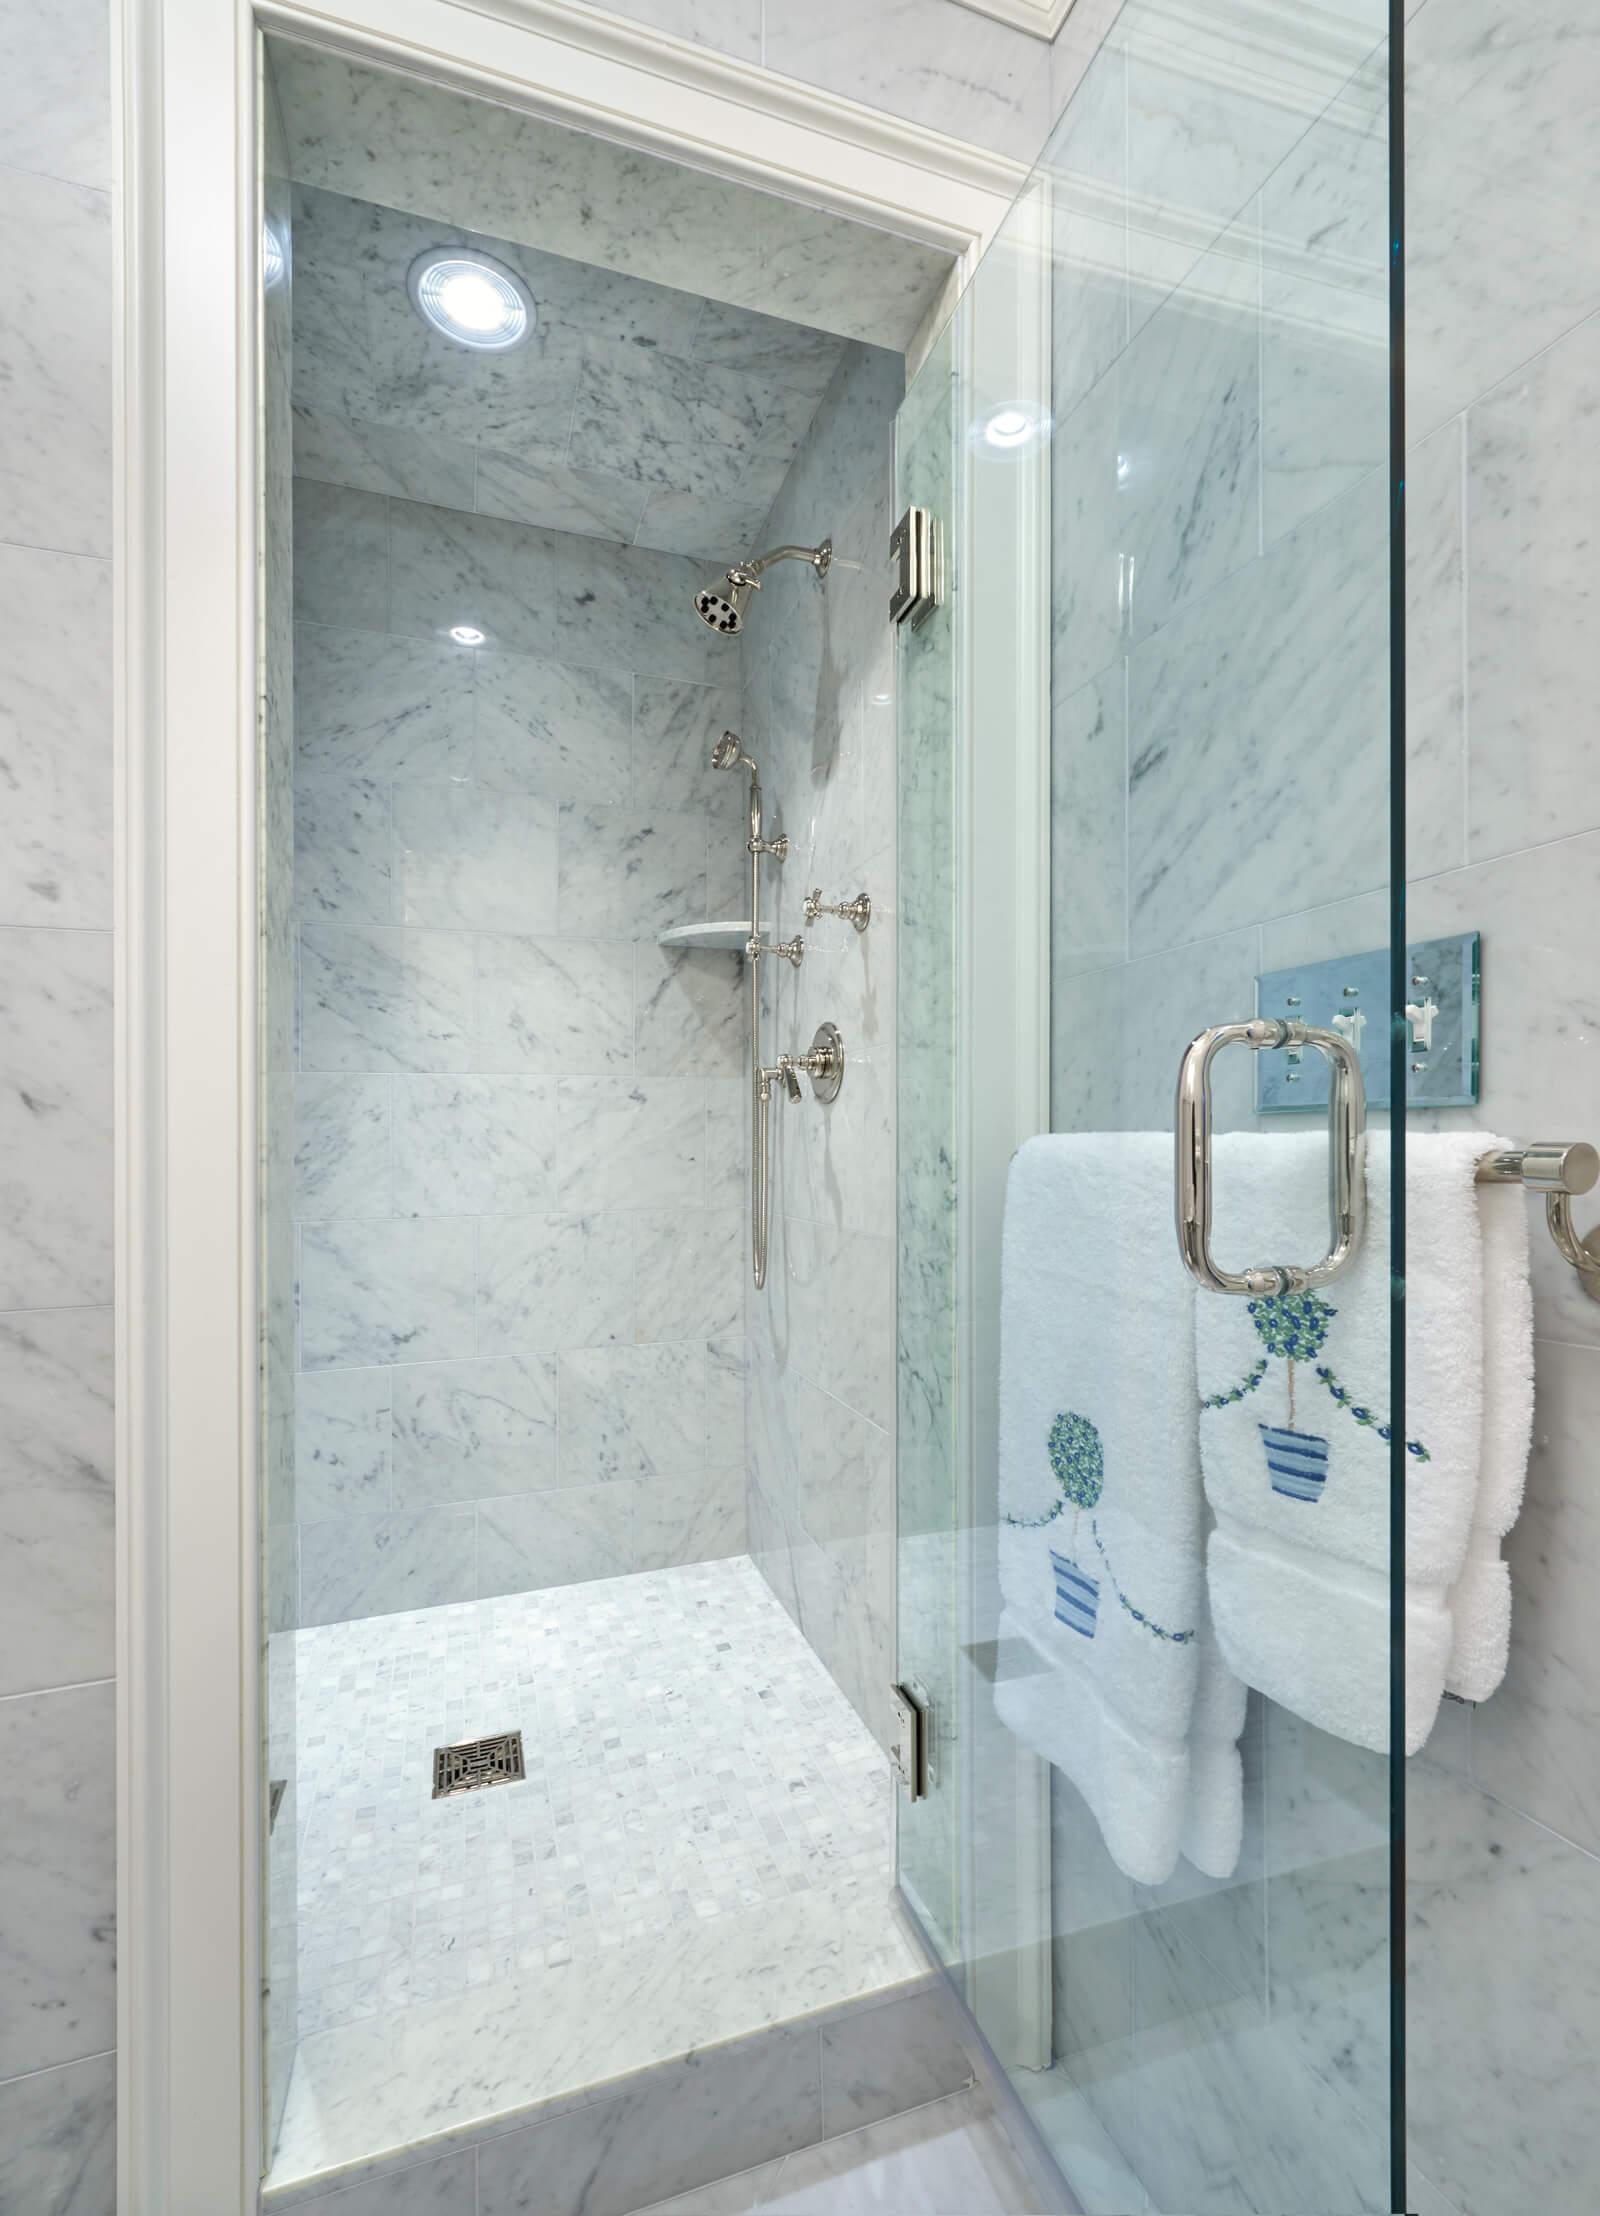 Cararra Marble Wall tile Cararra Mosaic Floor